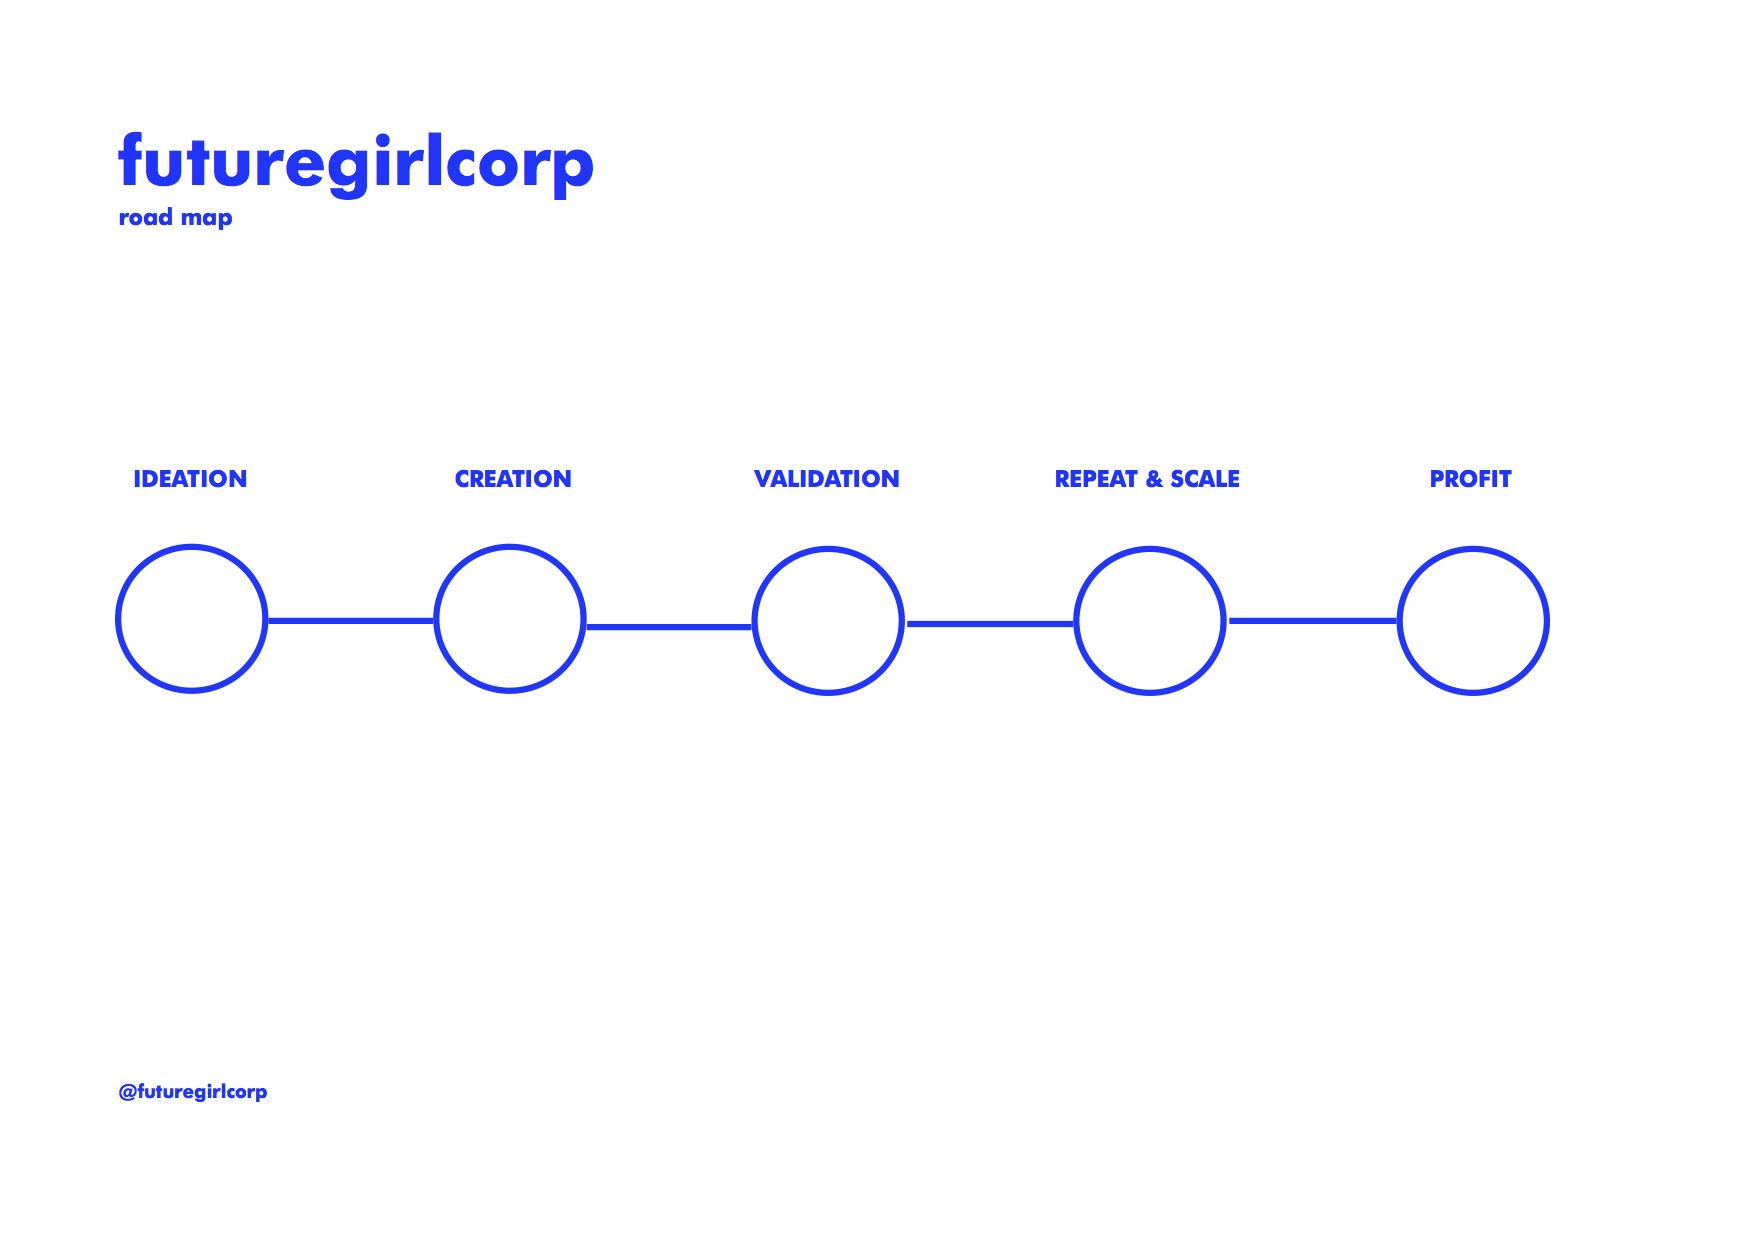 FutureGirlCorp | Business Roadmap